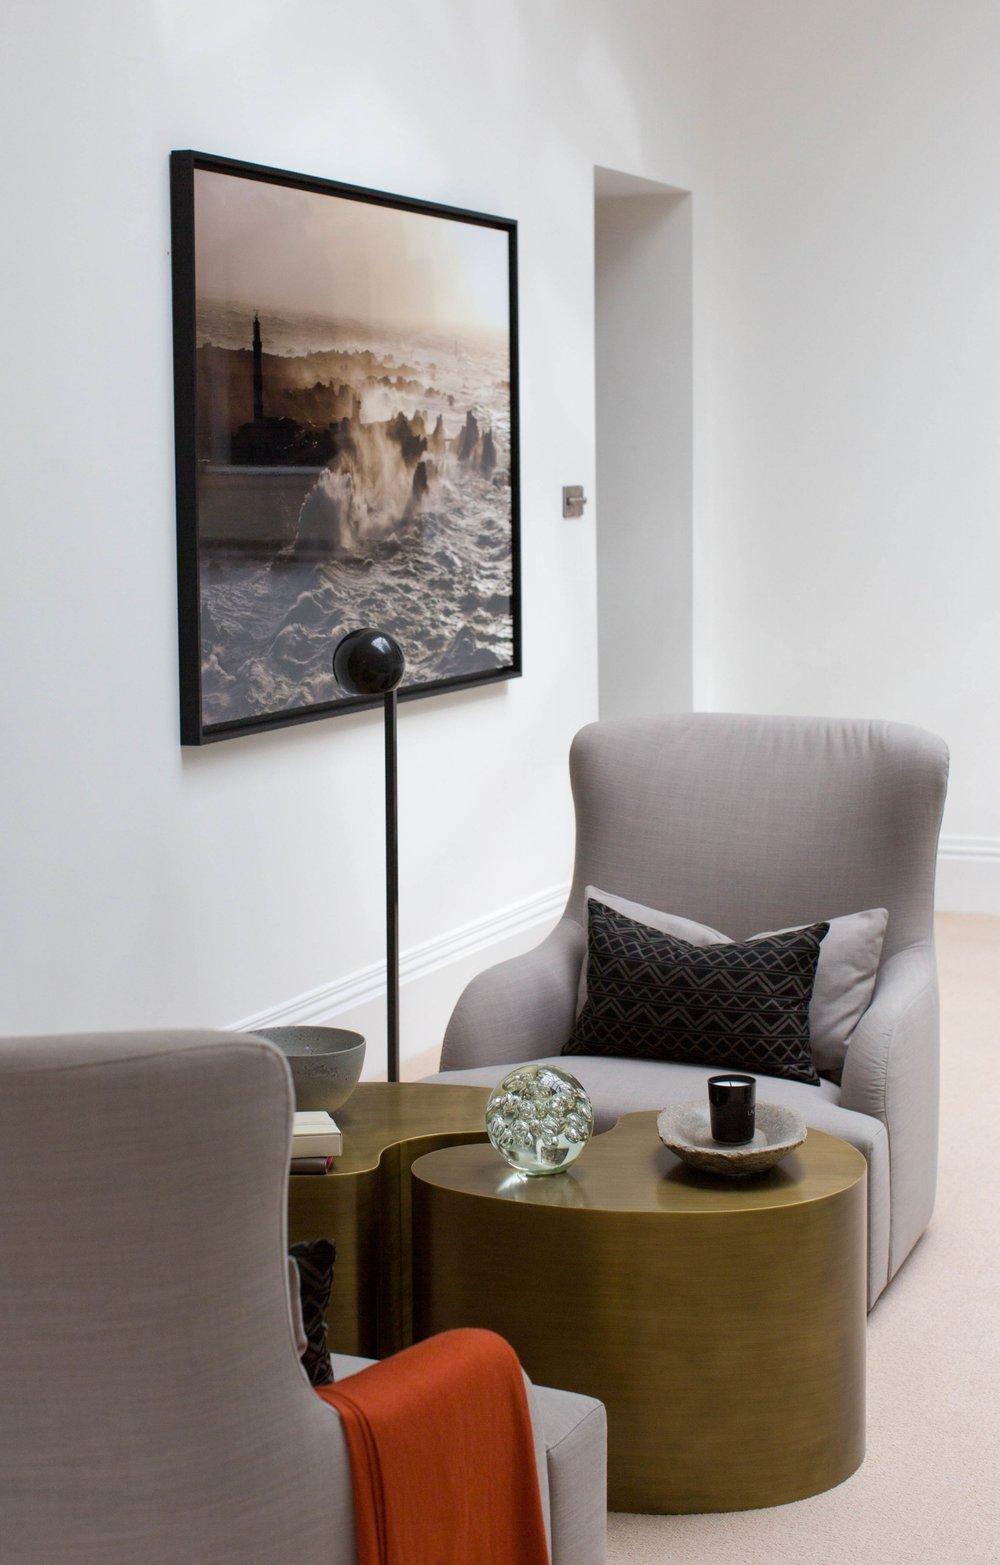 Lissi London Interior DesignSTUDY